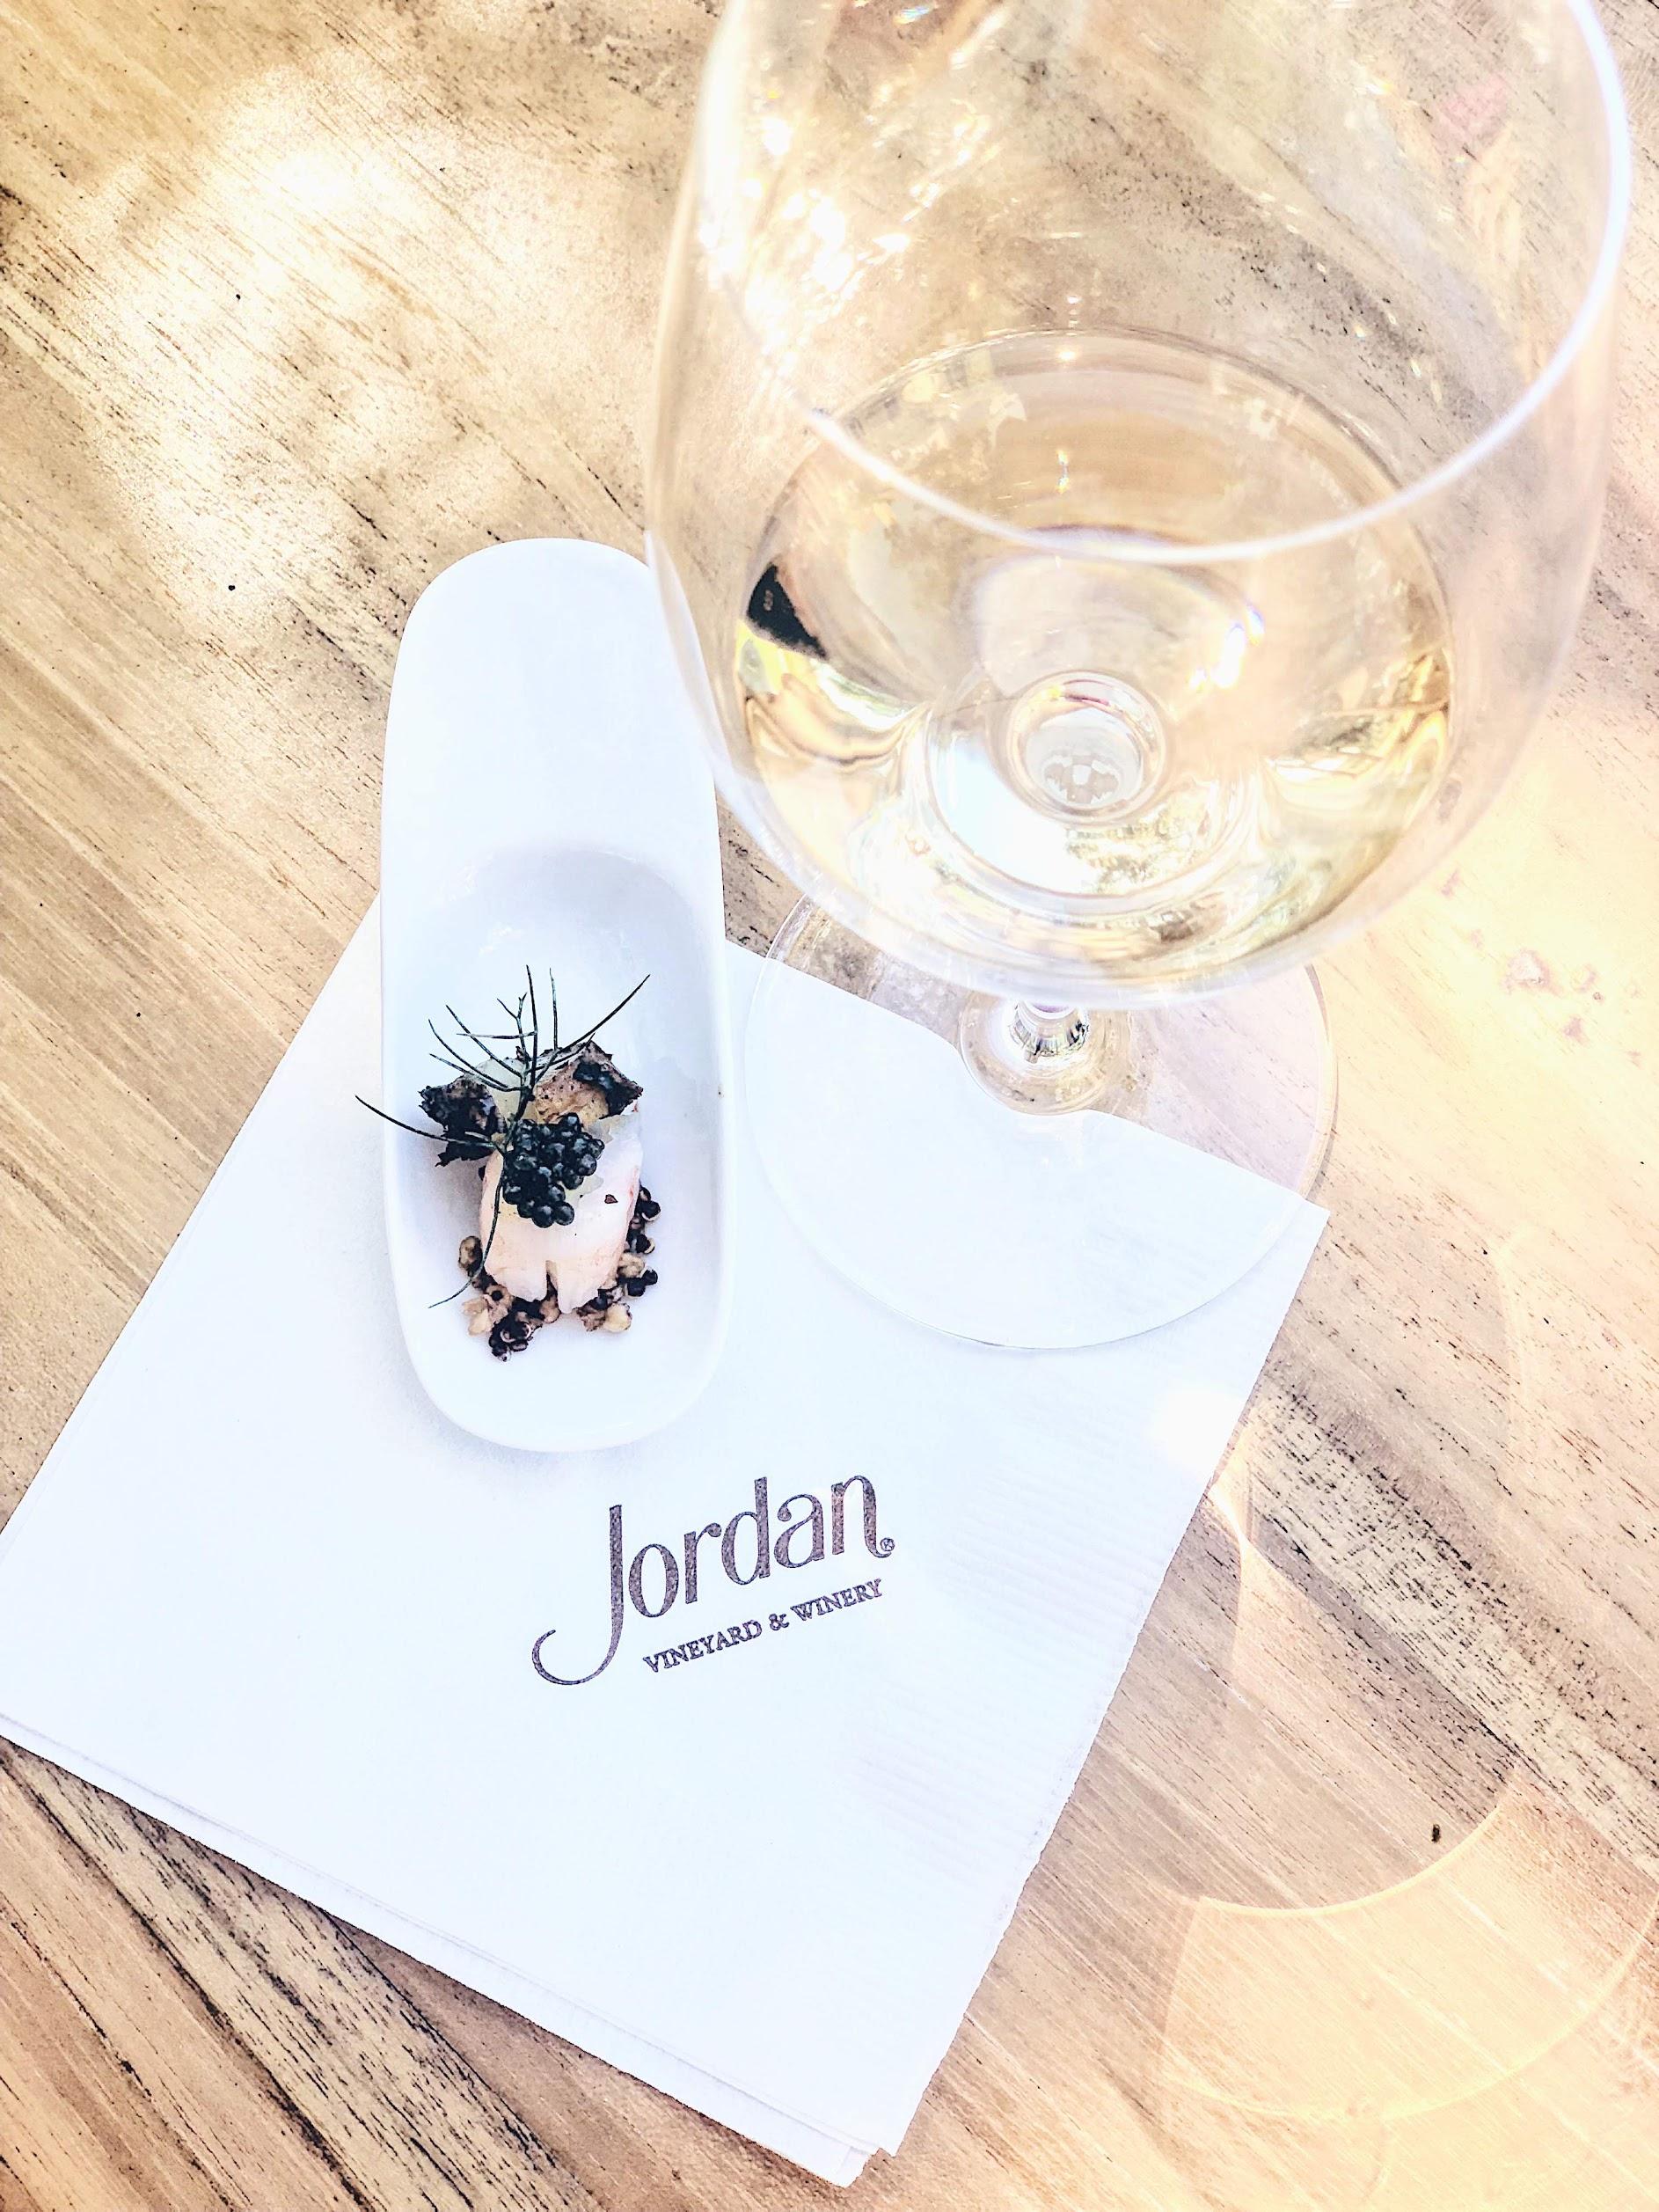 Caviar And Chardonnay At Jordan Winery